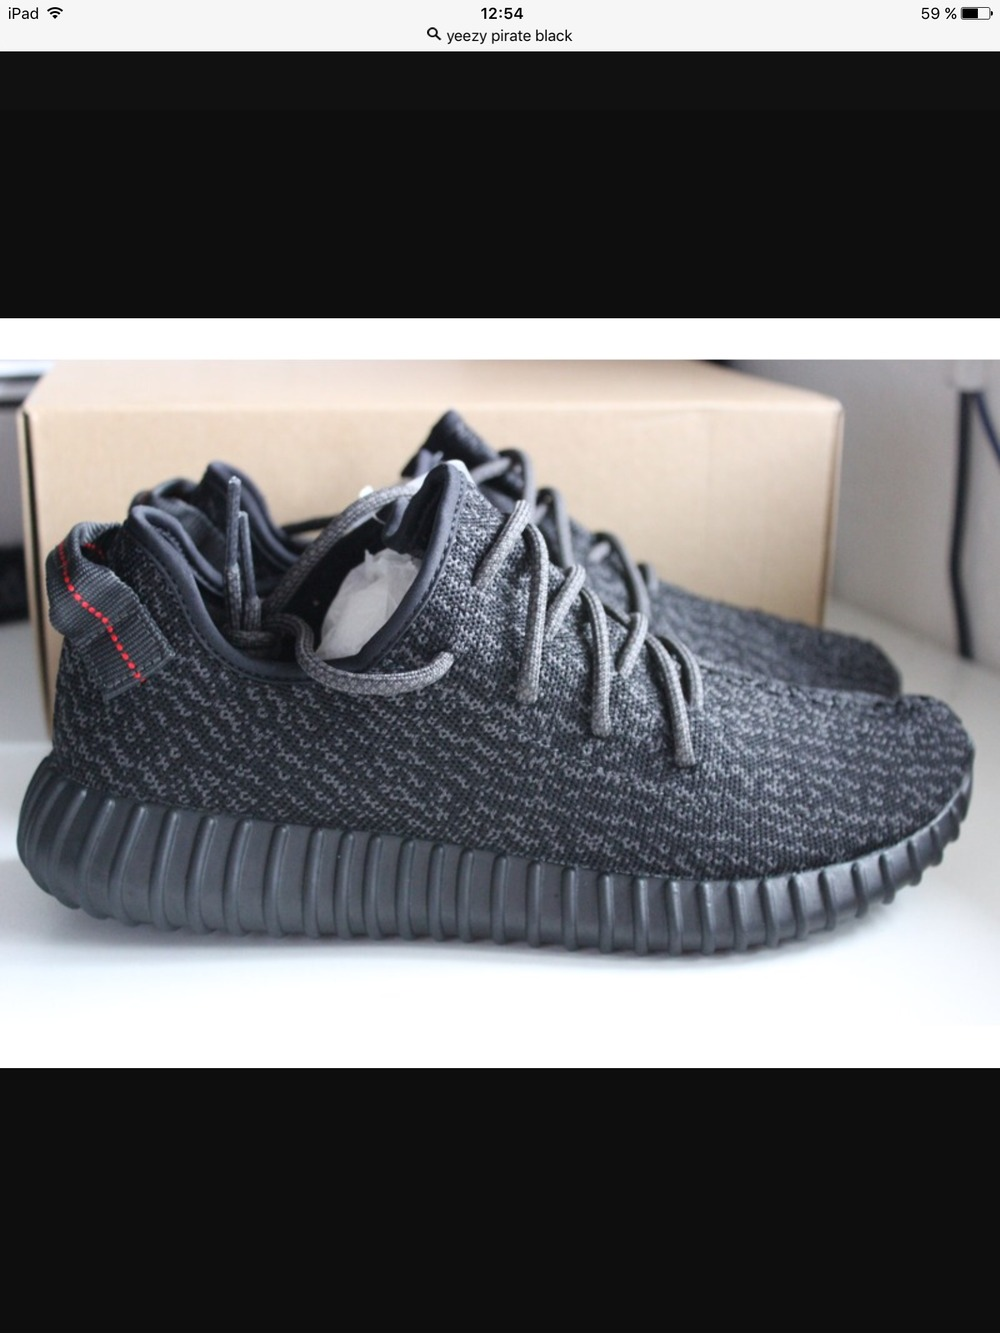 adidas yeezy boost 350 42